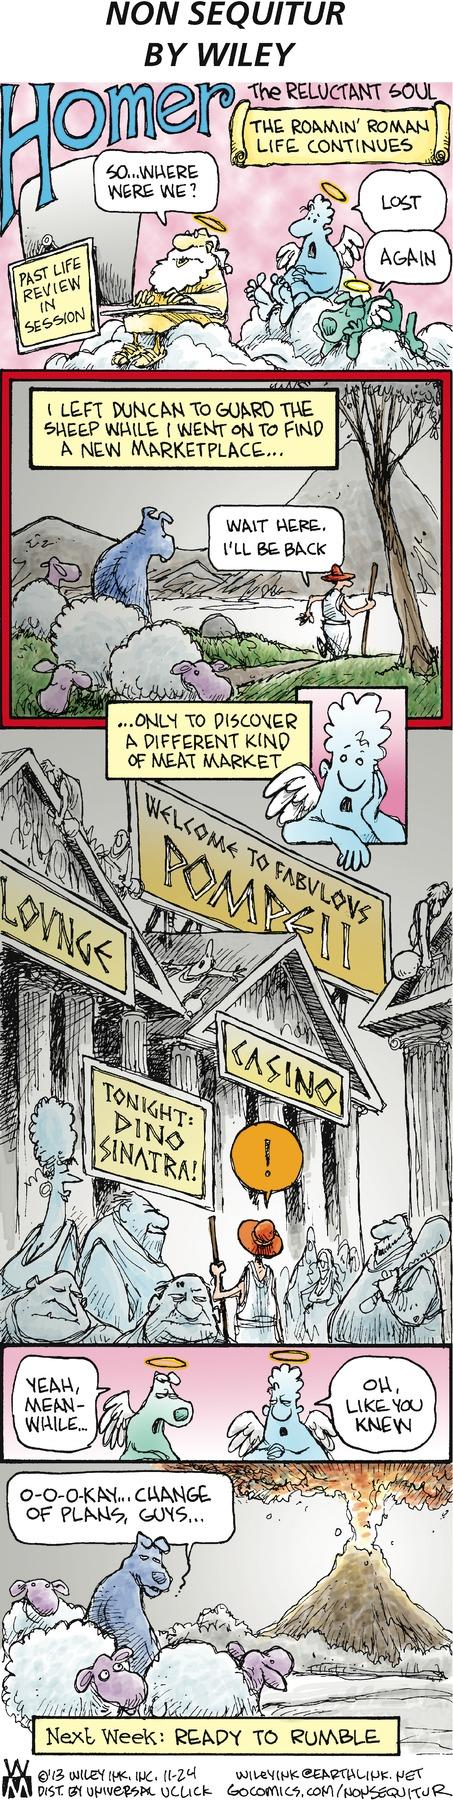 Non Sequitur for Nov 24, 2013 Comic Strip